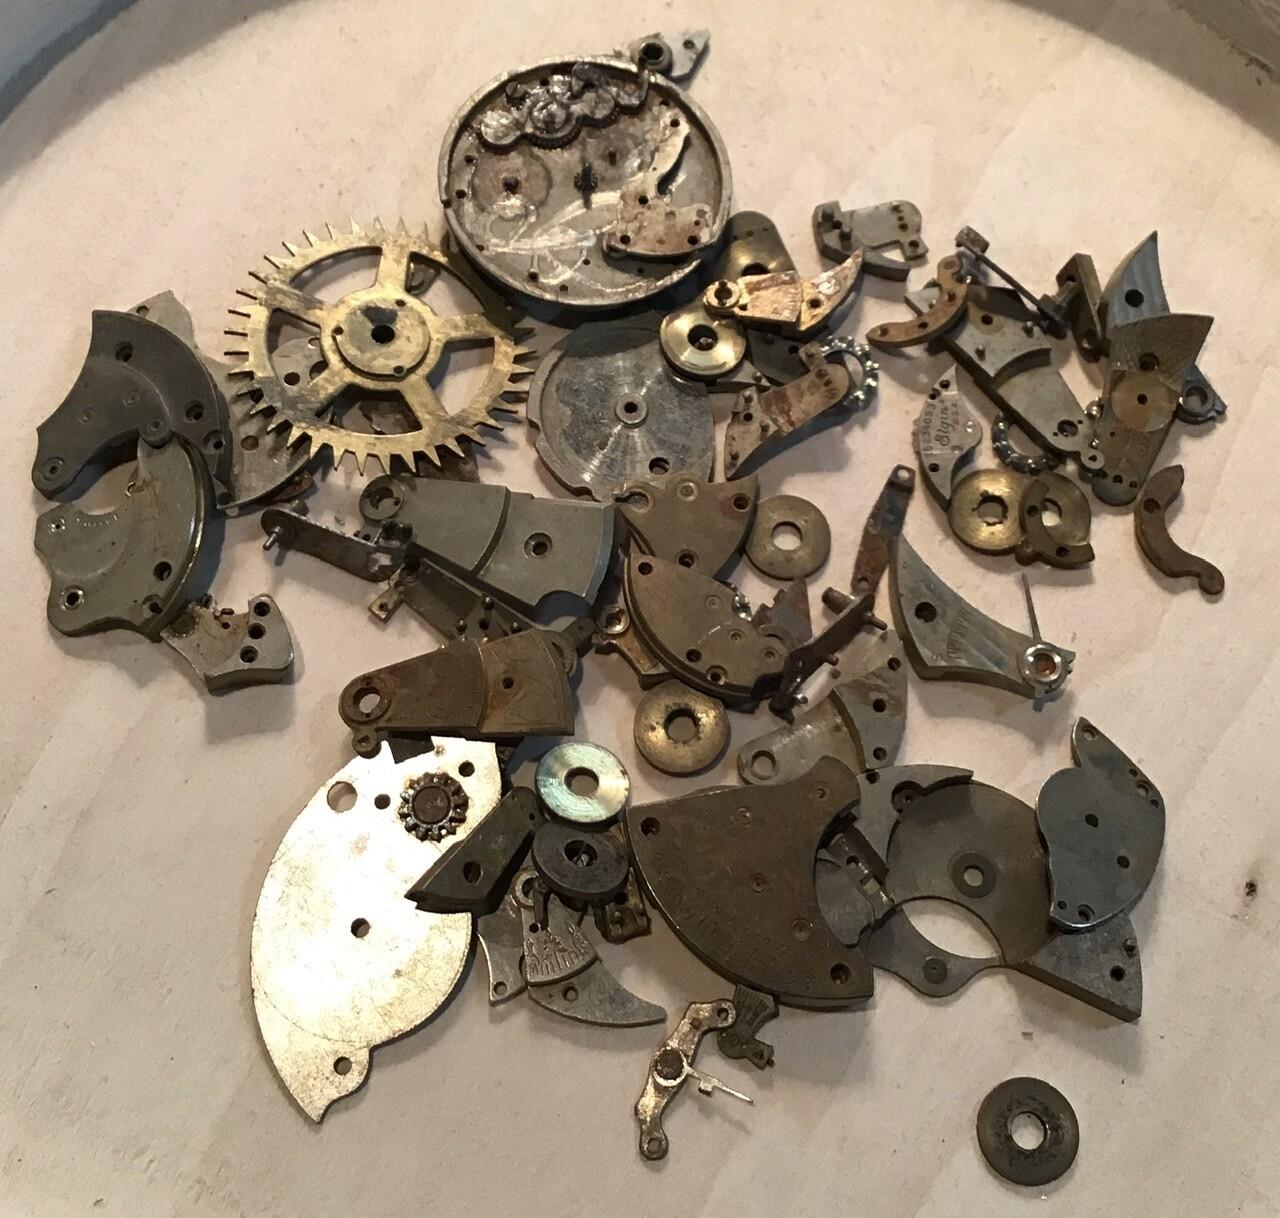 Watch Parts (Gears) / Vintage / #3